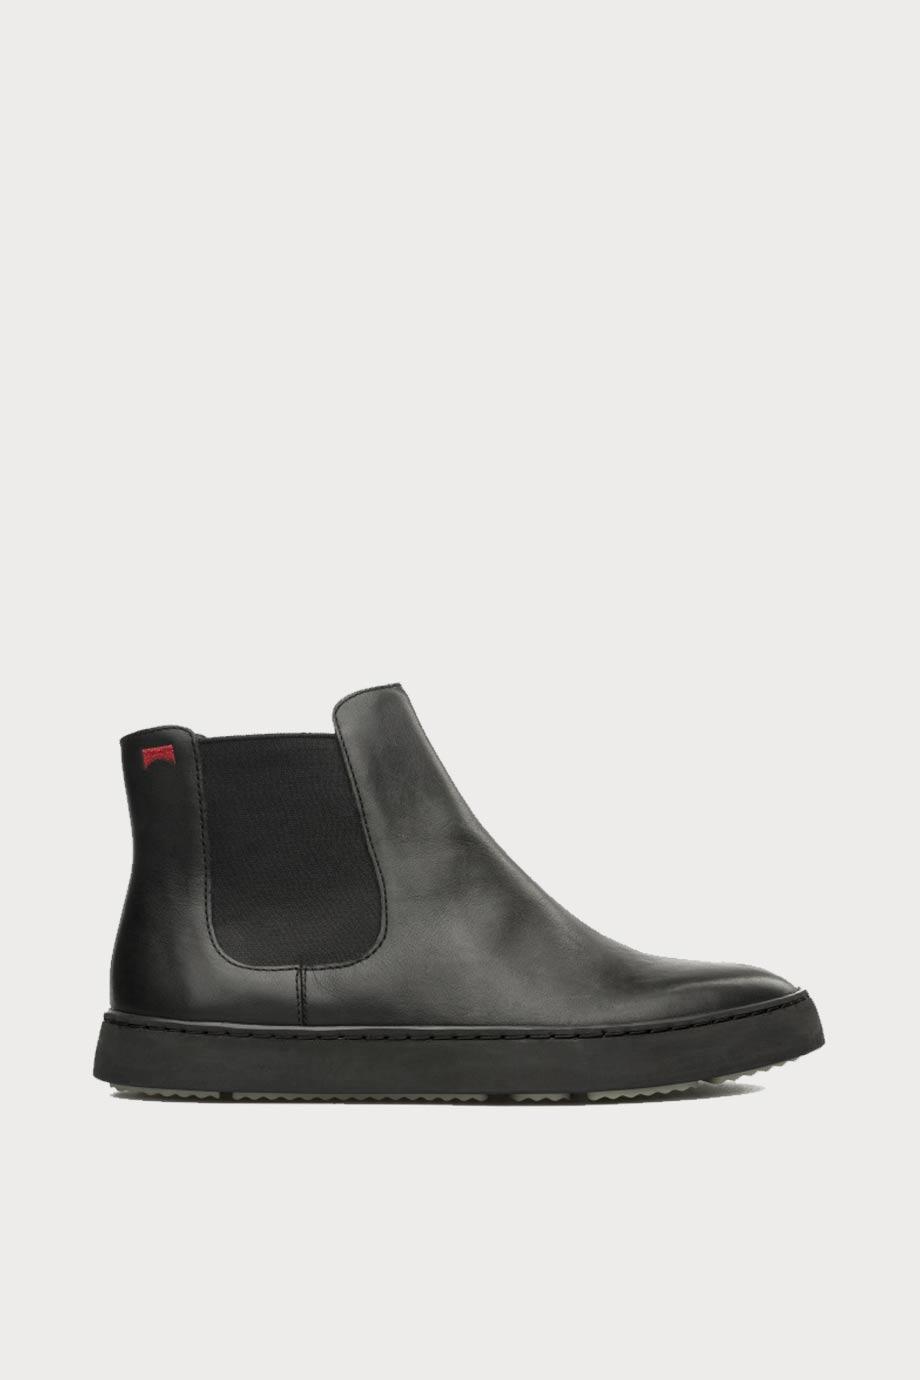 spiridoula metheniti shoes xalkida p Camper 36715 003 Cargol2